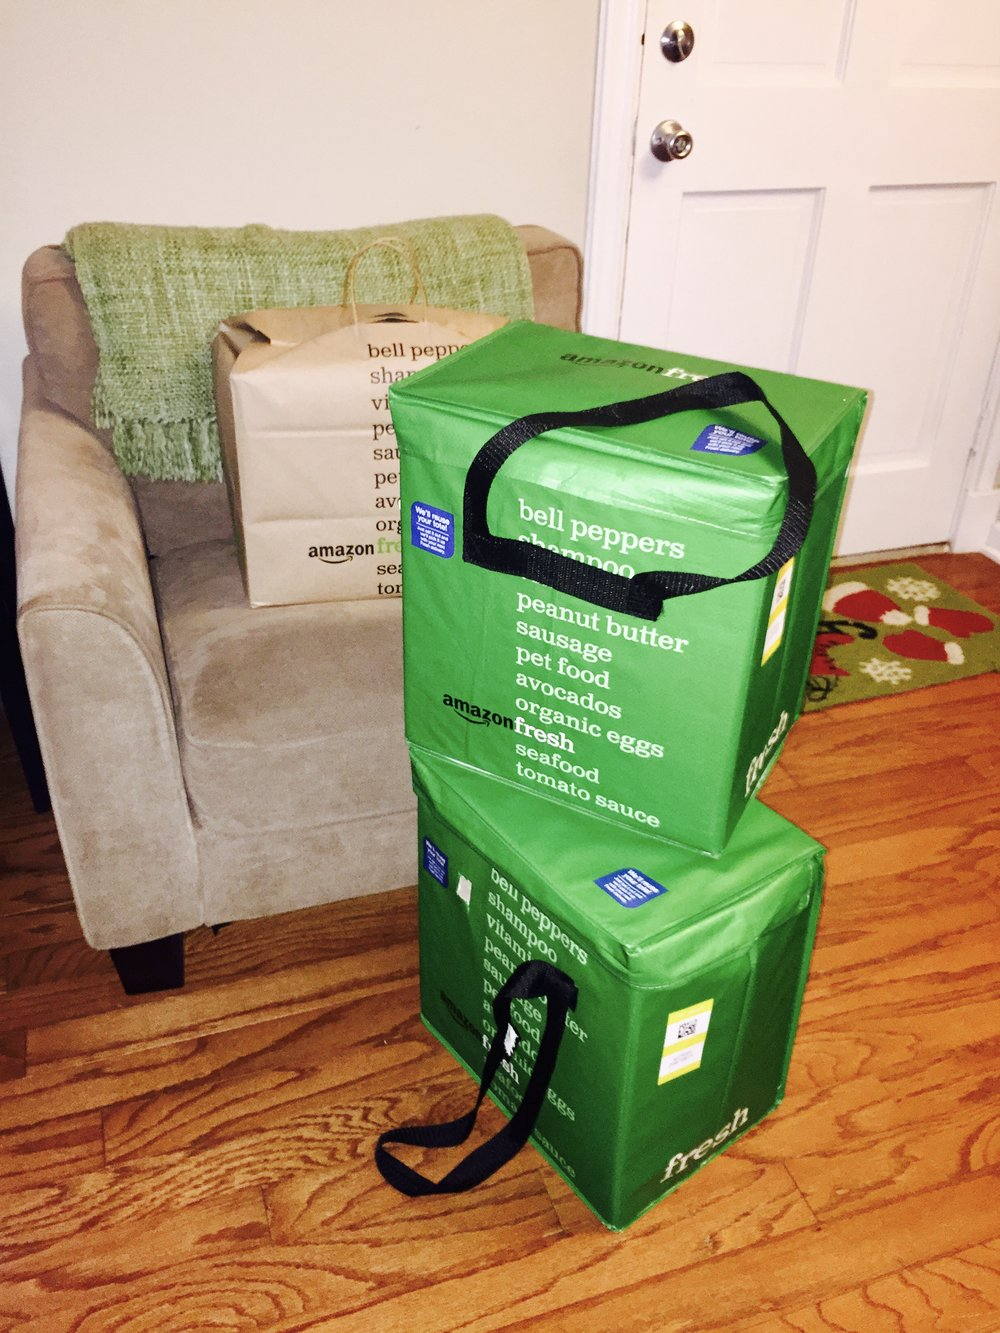 Amazon Fresh delivery!